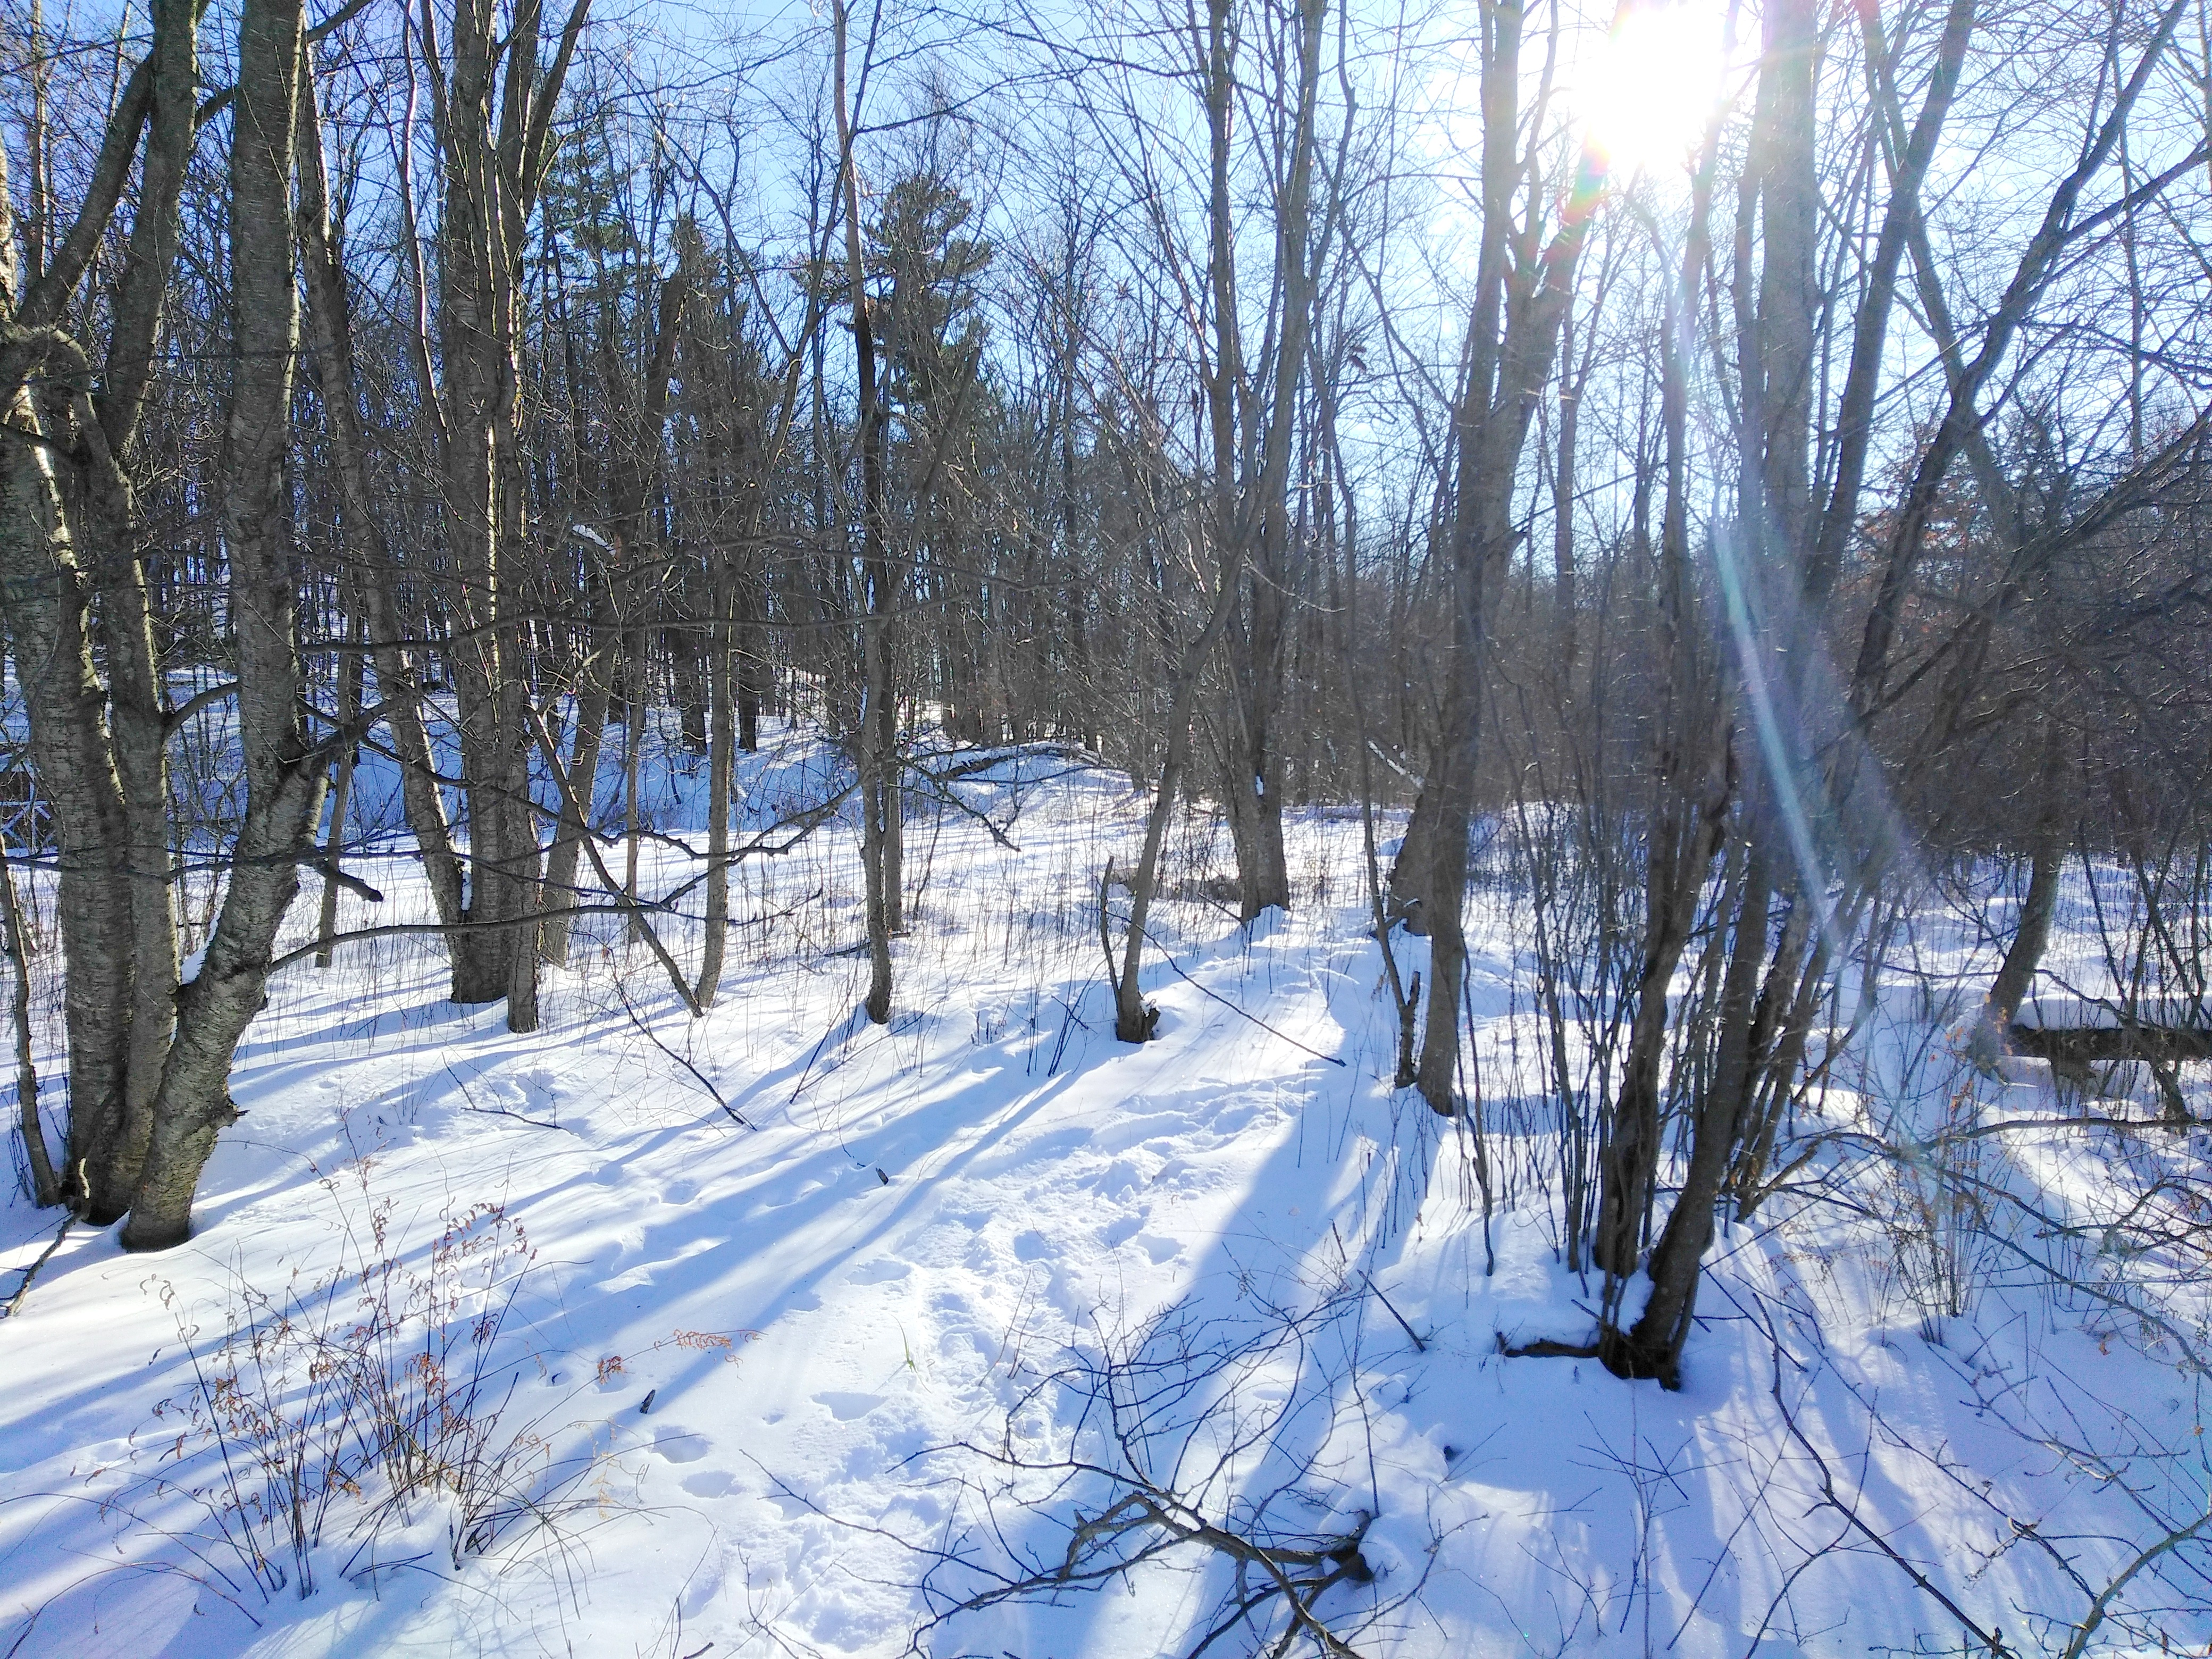 sun peaking through the trees snowshoeing at lost lake